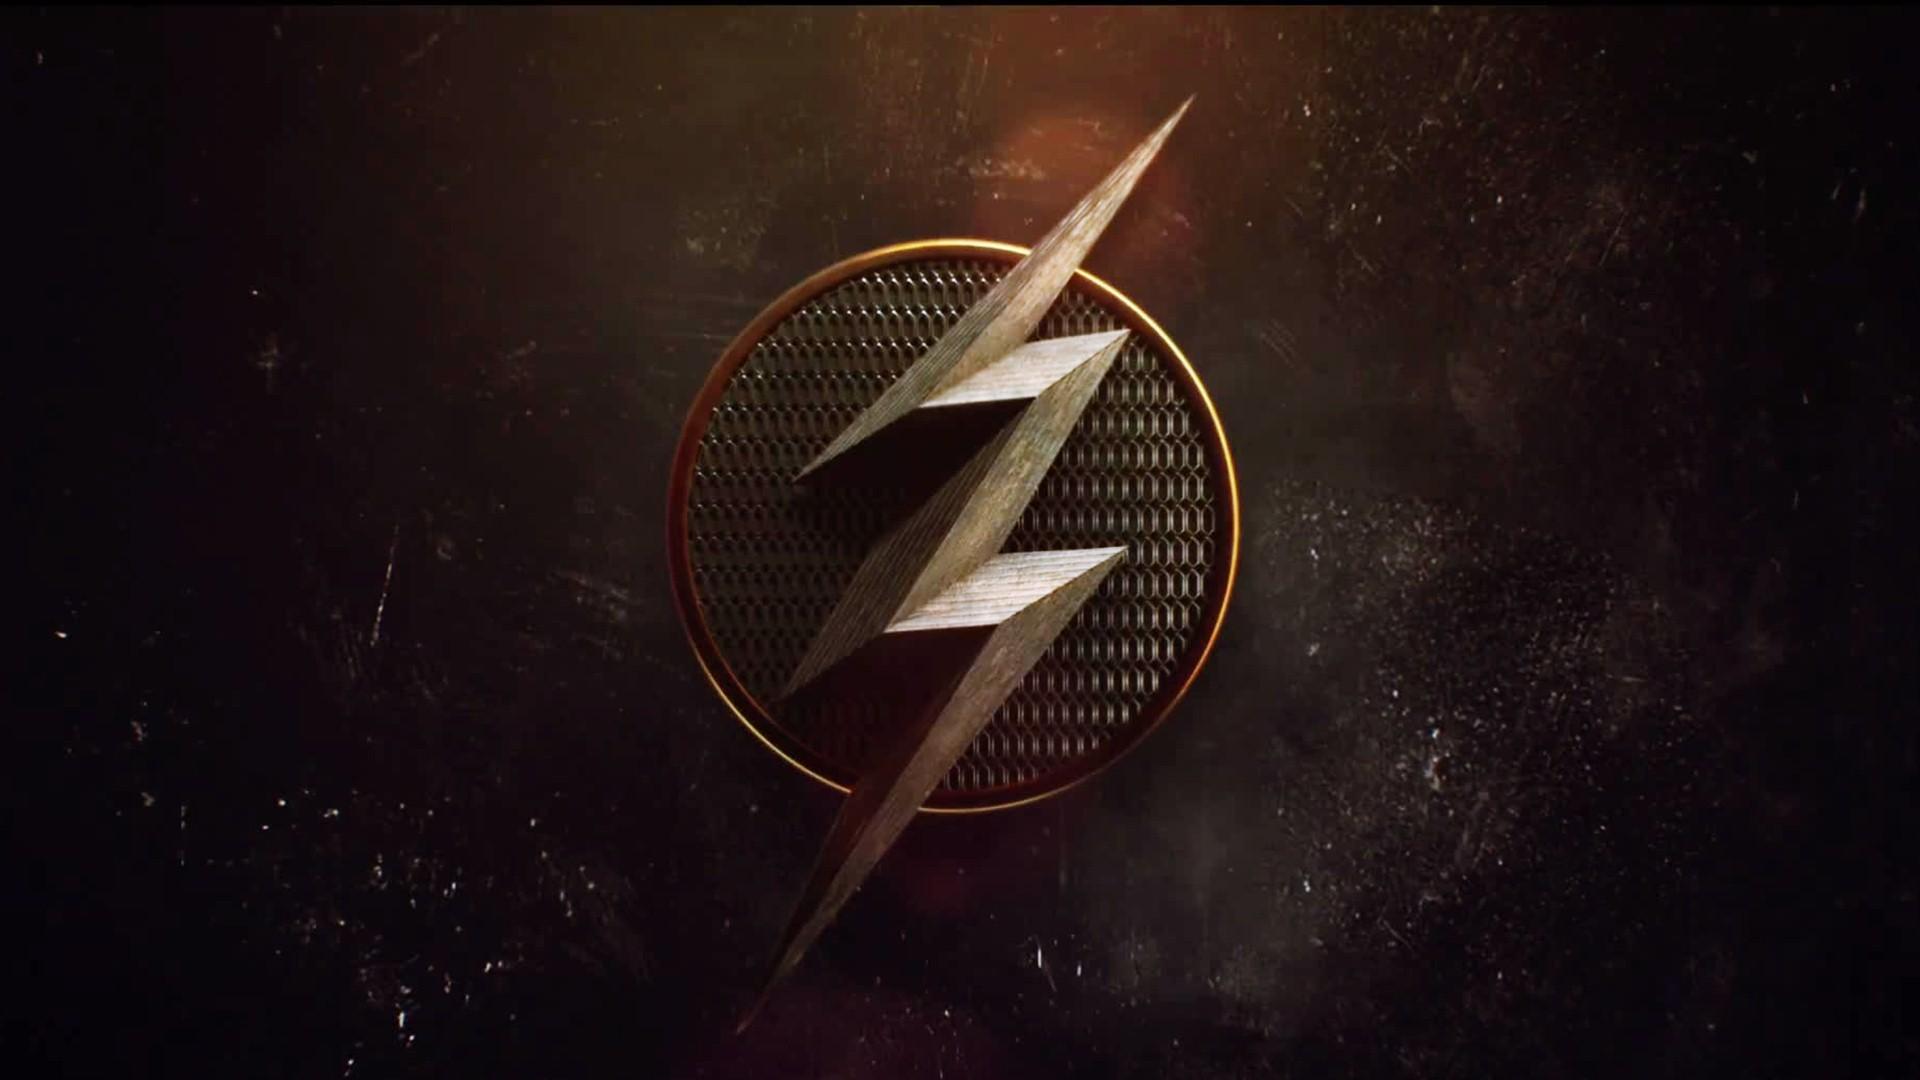 Justice League Hd Wallpaper The Flash 4k Wallpaper 65 Images